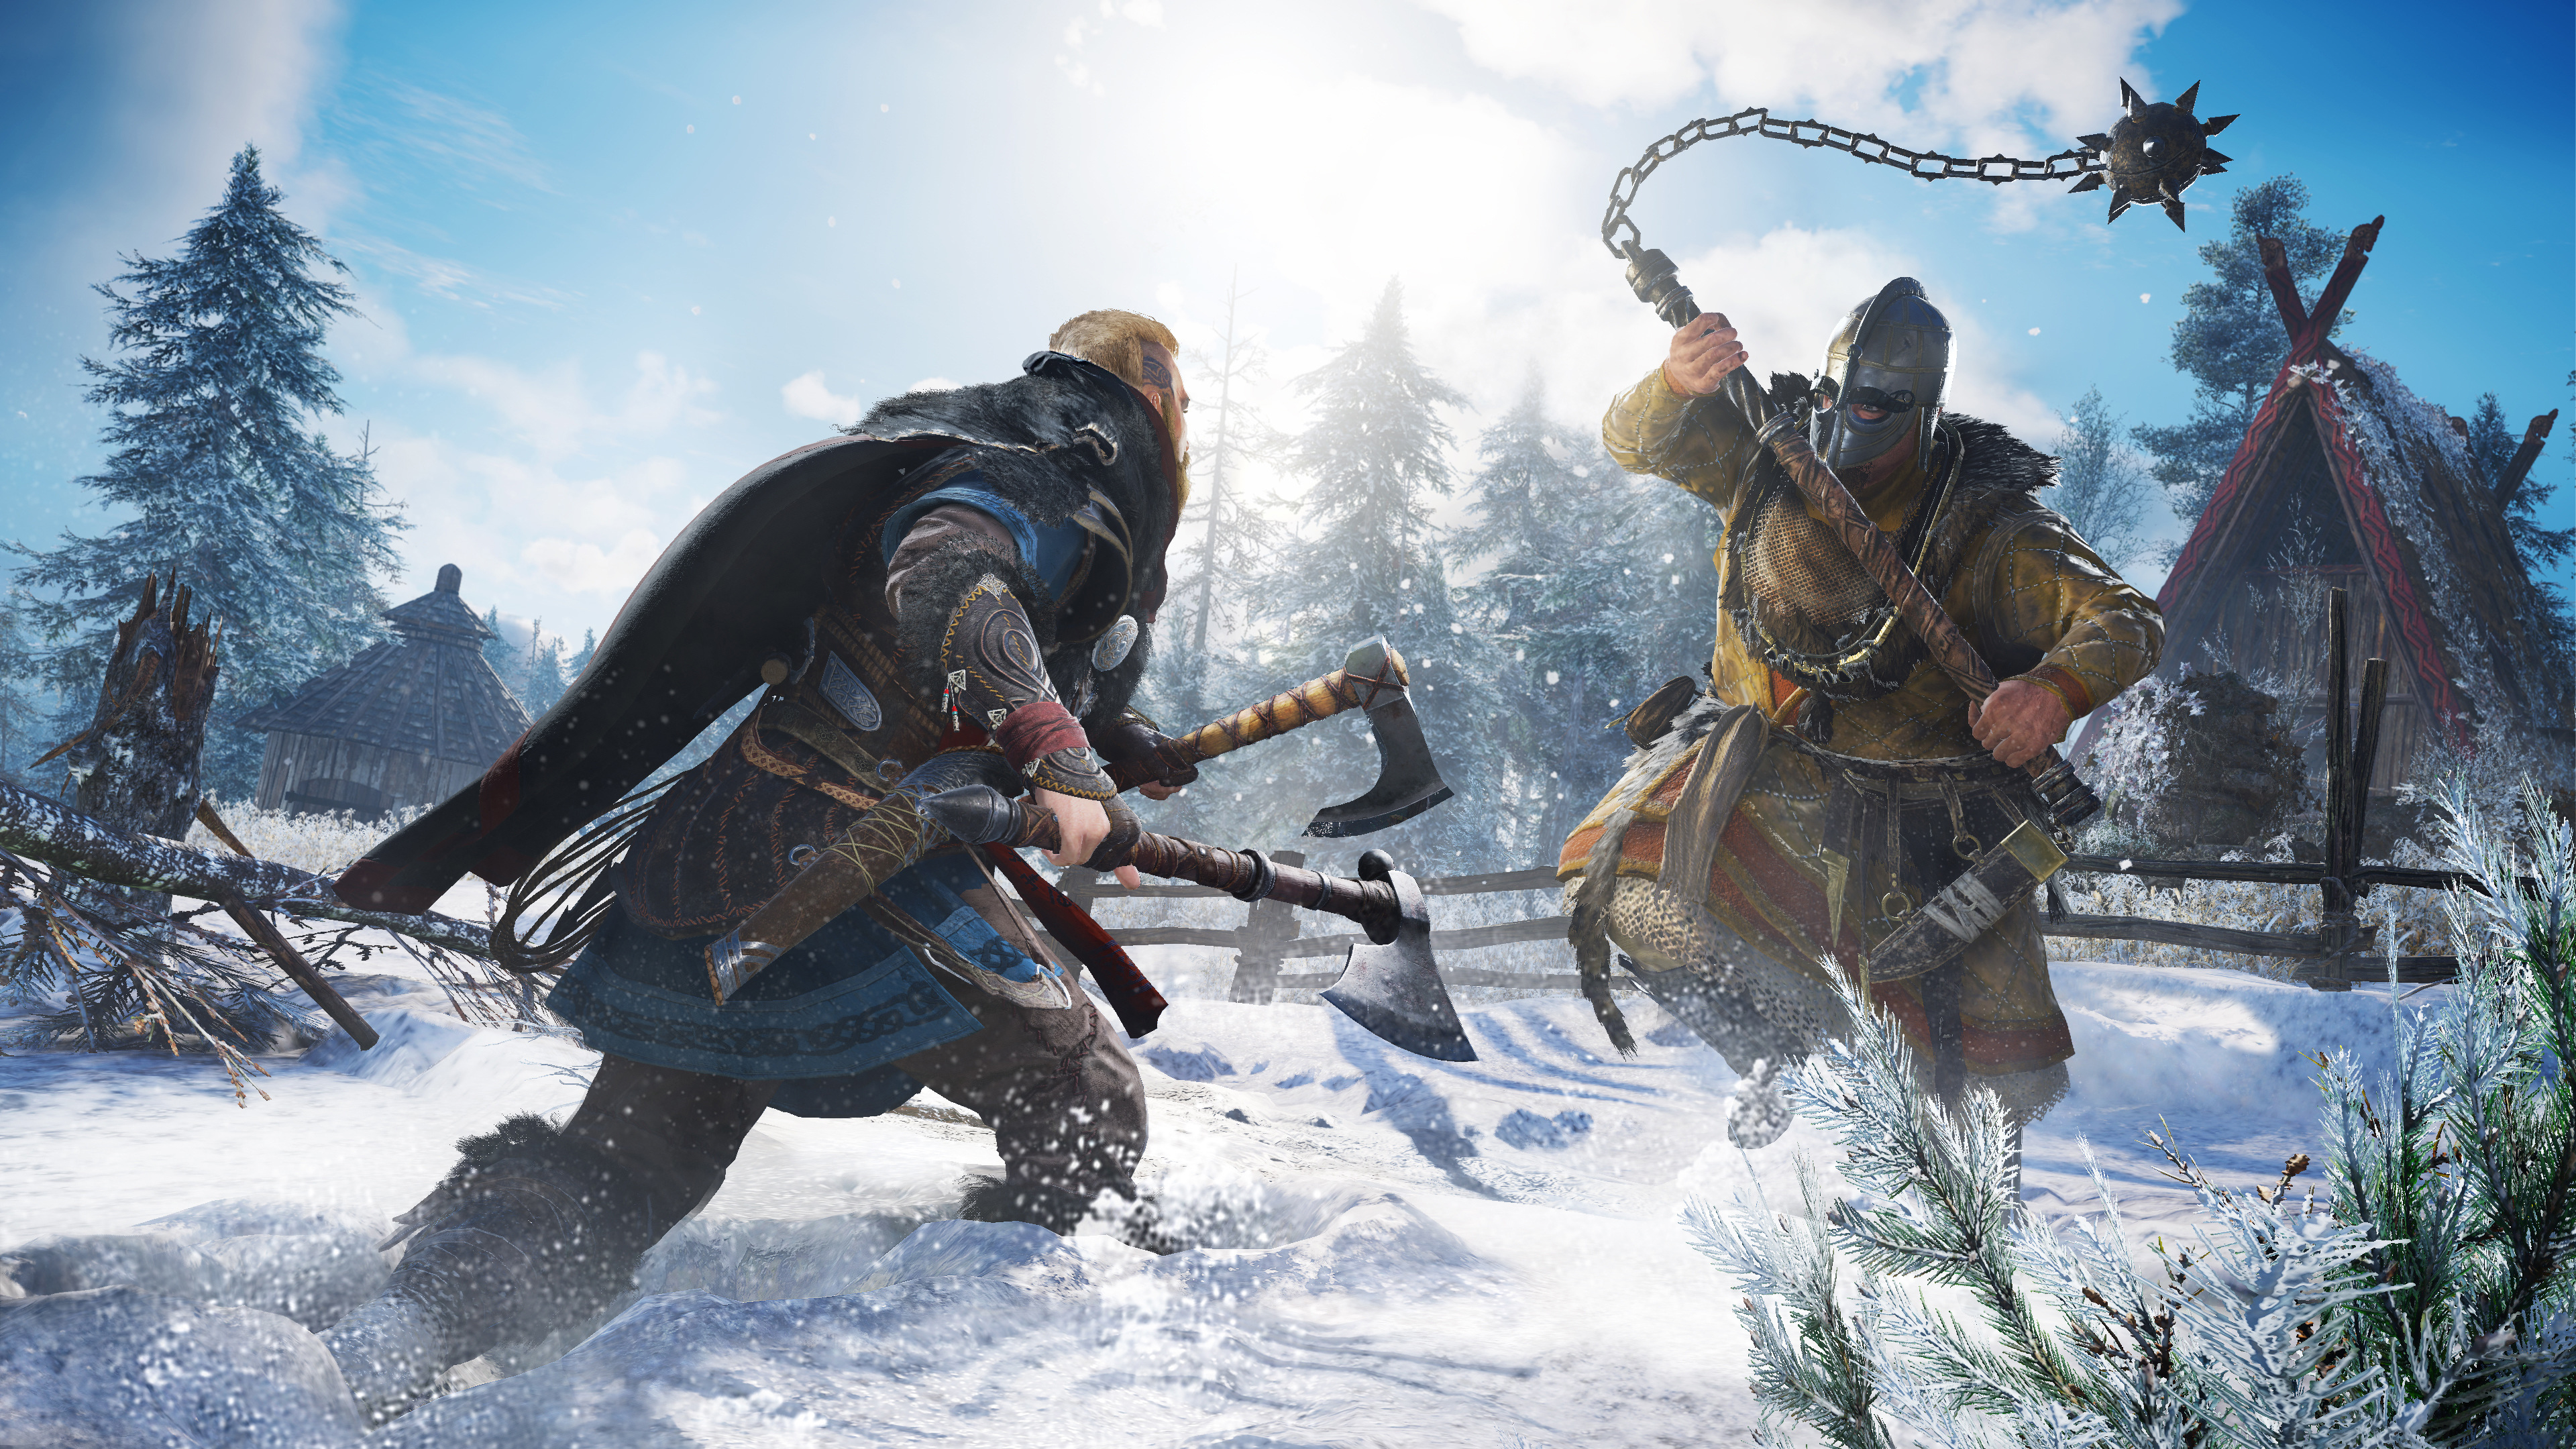 Assassin's Creed Valhalla Warrior Battle Wallpaper, HD ...